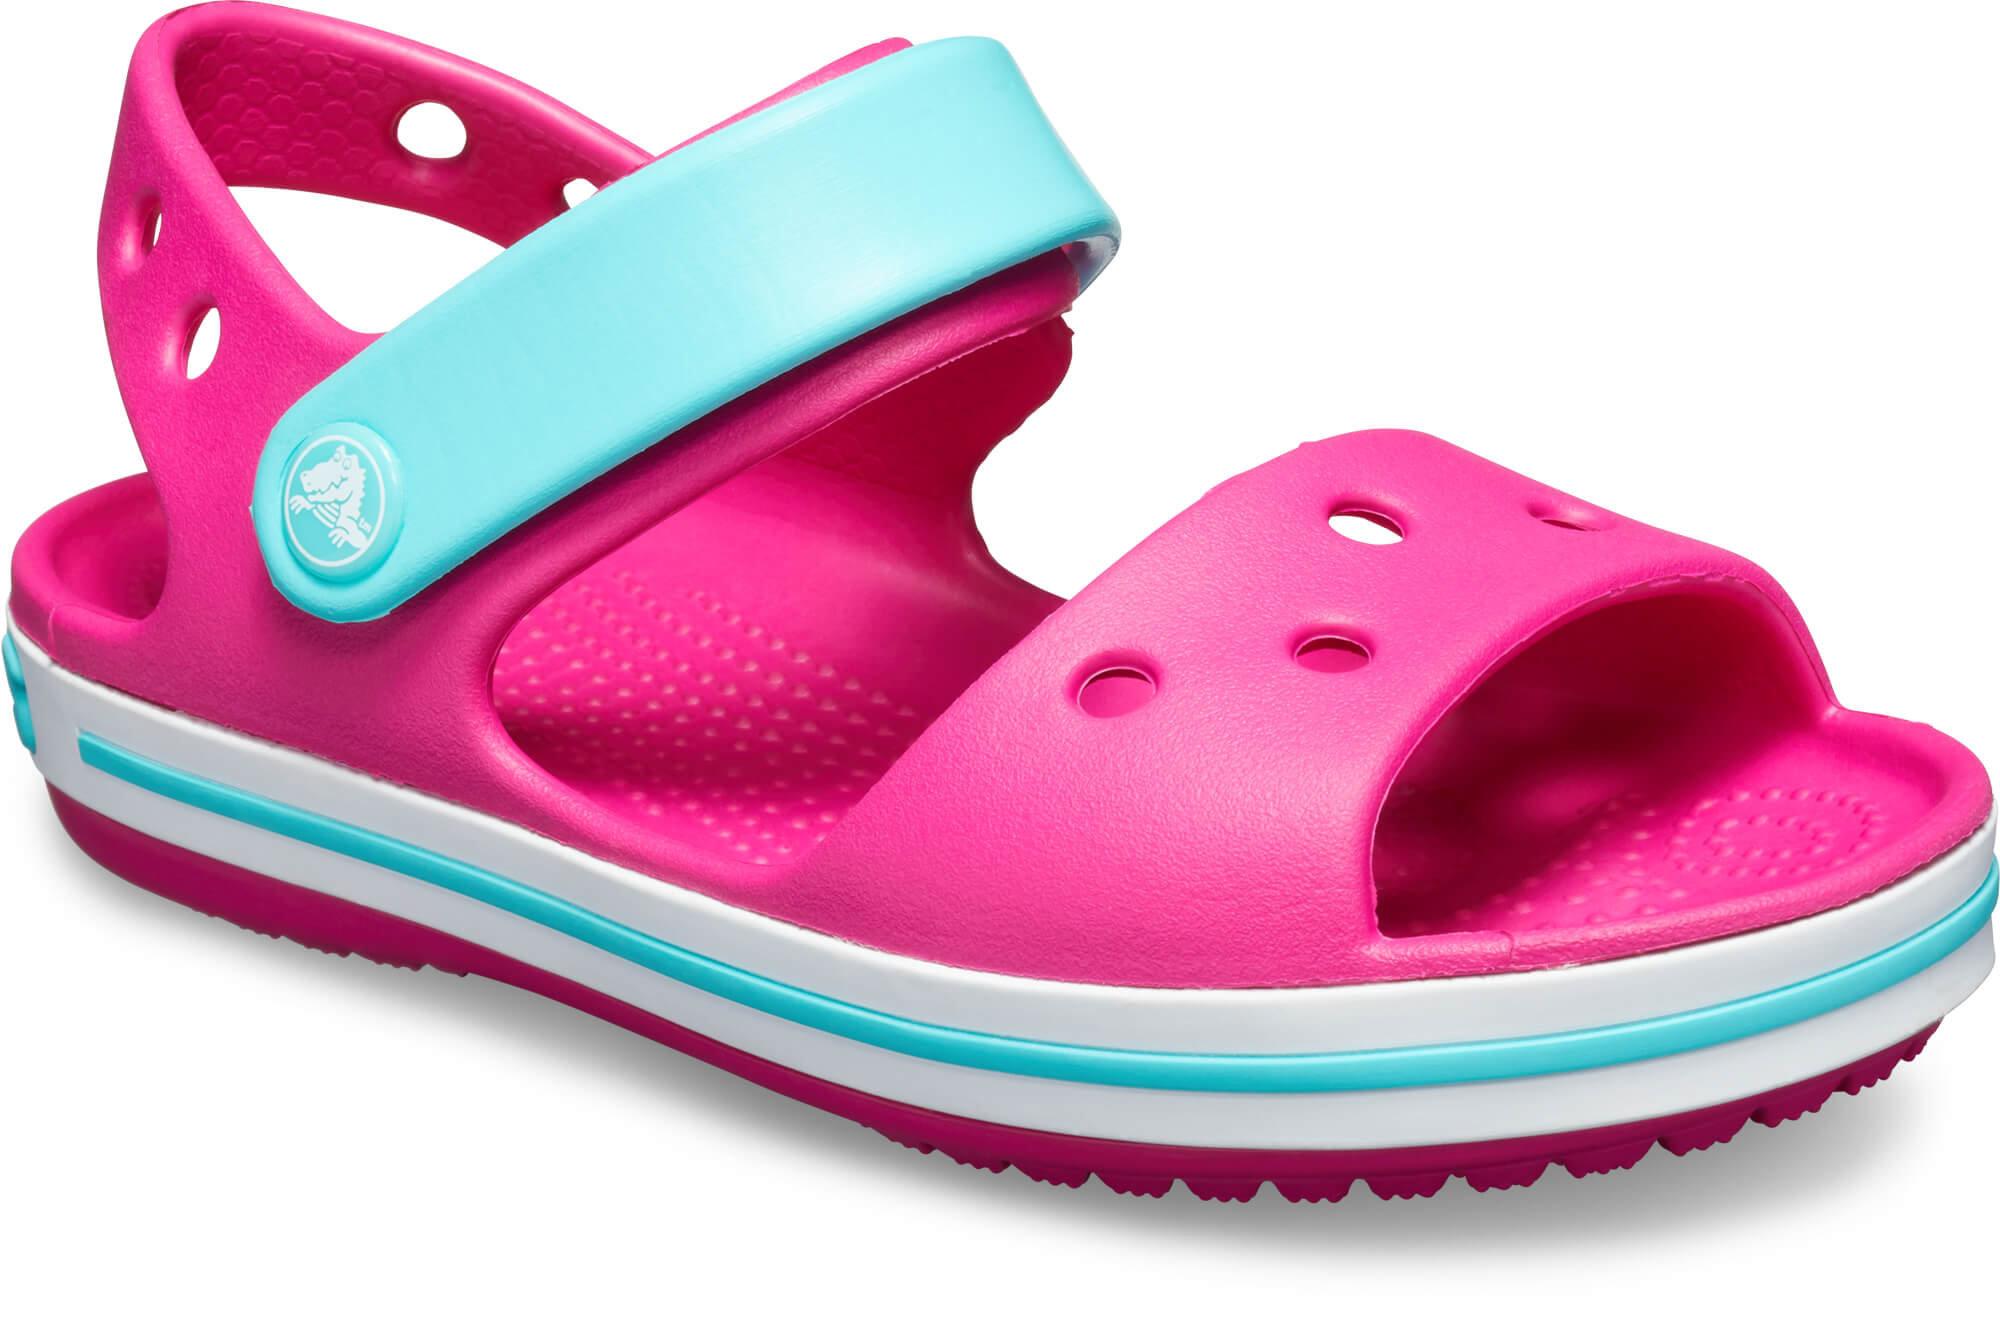 Candy Sandal Crocs Pool Kids Pink Crocband OTkiwXPuZ